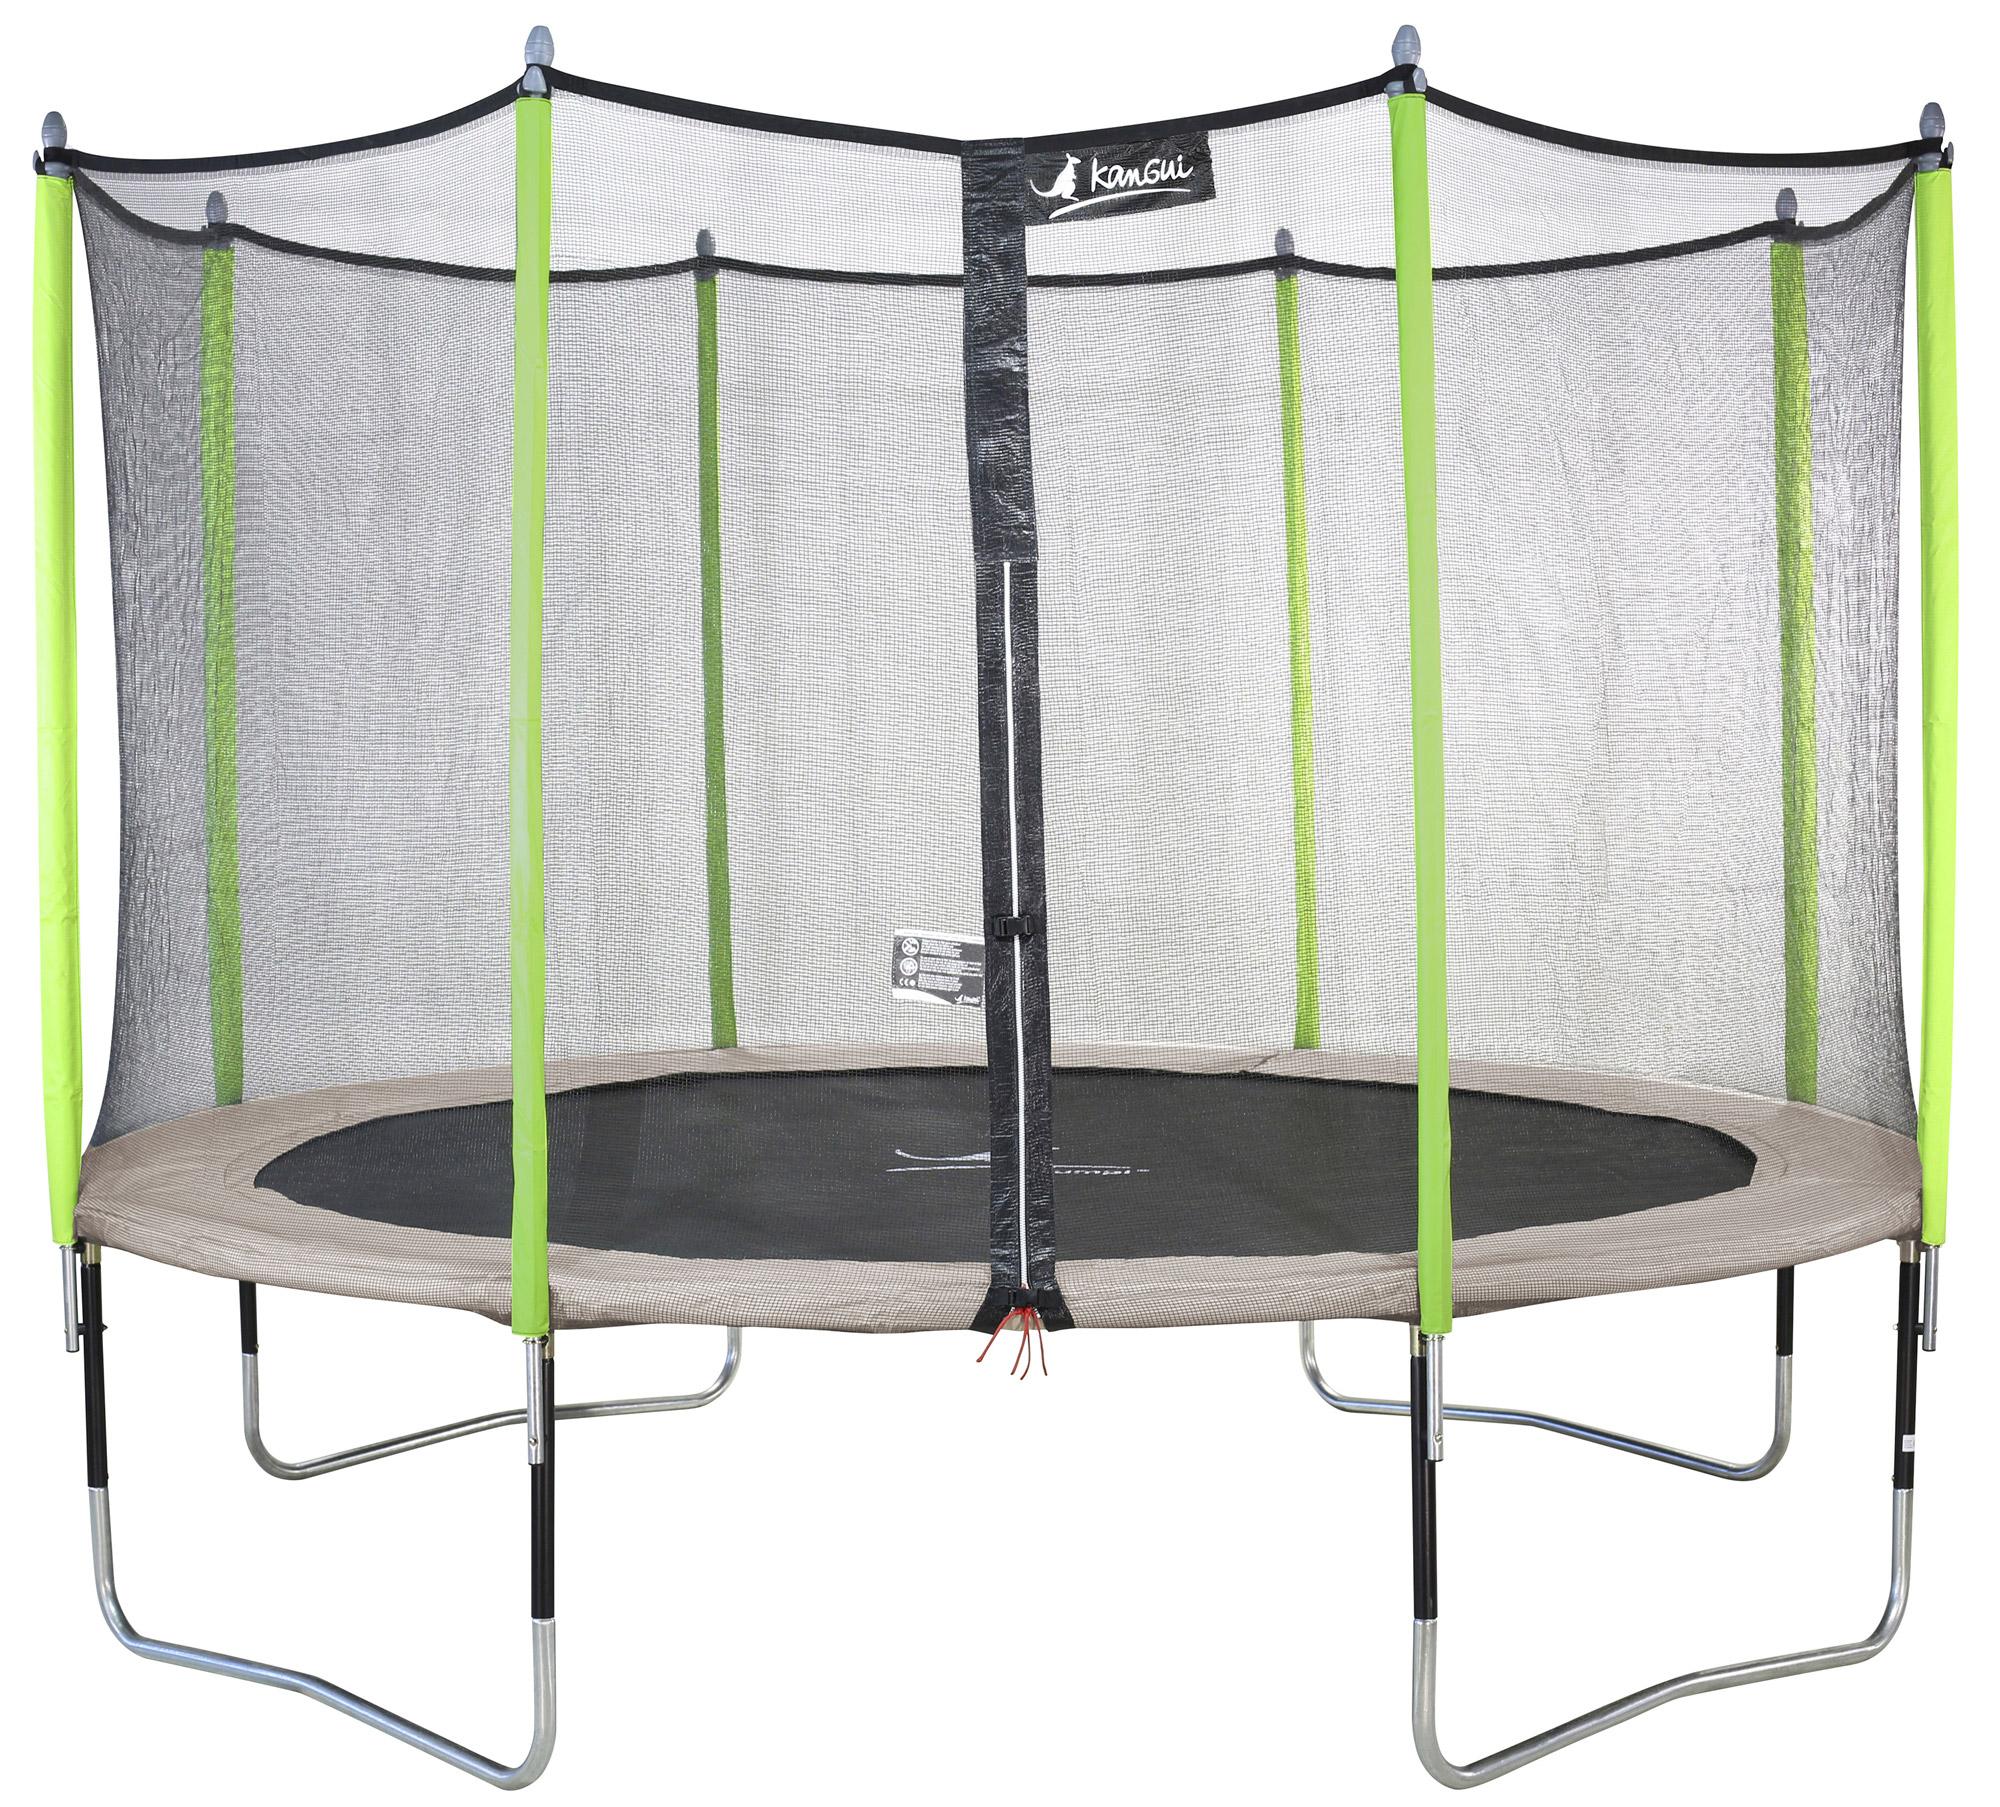 kangui trampoline de jardin 305 360 430 cm filet de s curit jumpi zen ebay. Black Bedroom Furniture Sets. Home Design Ideas